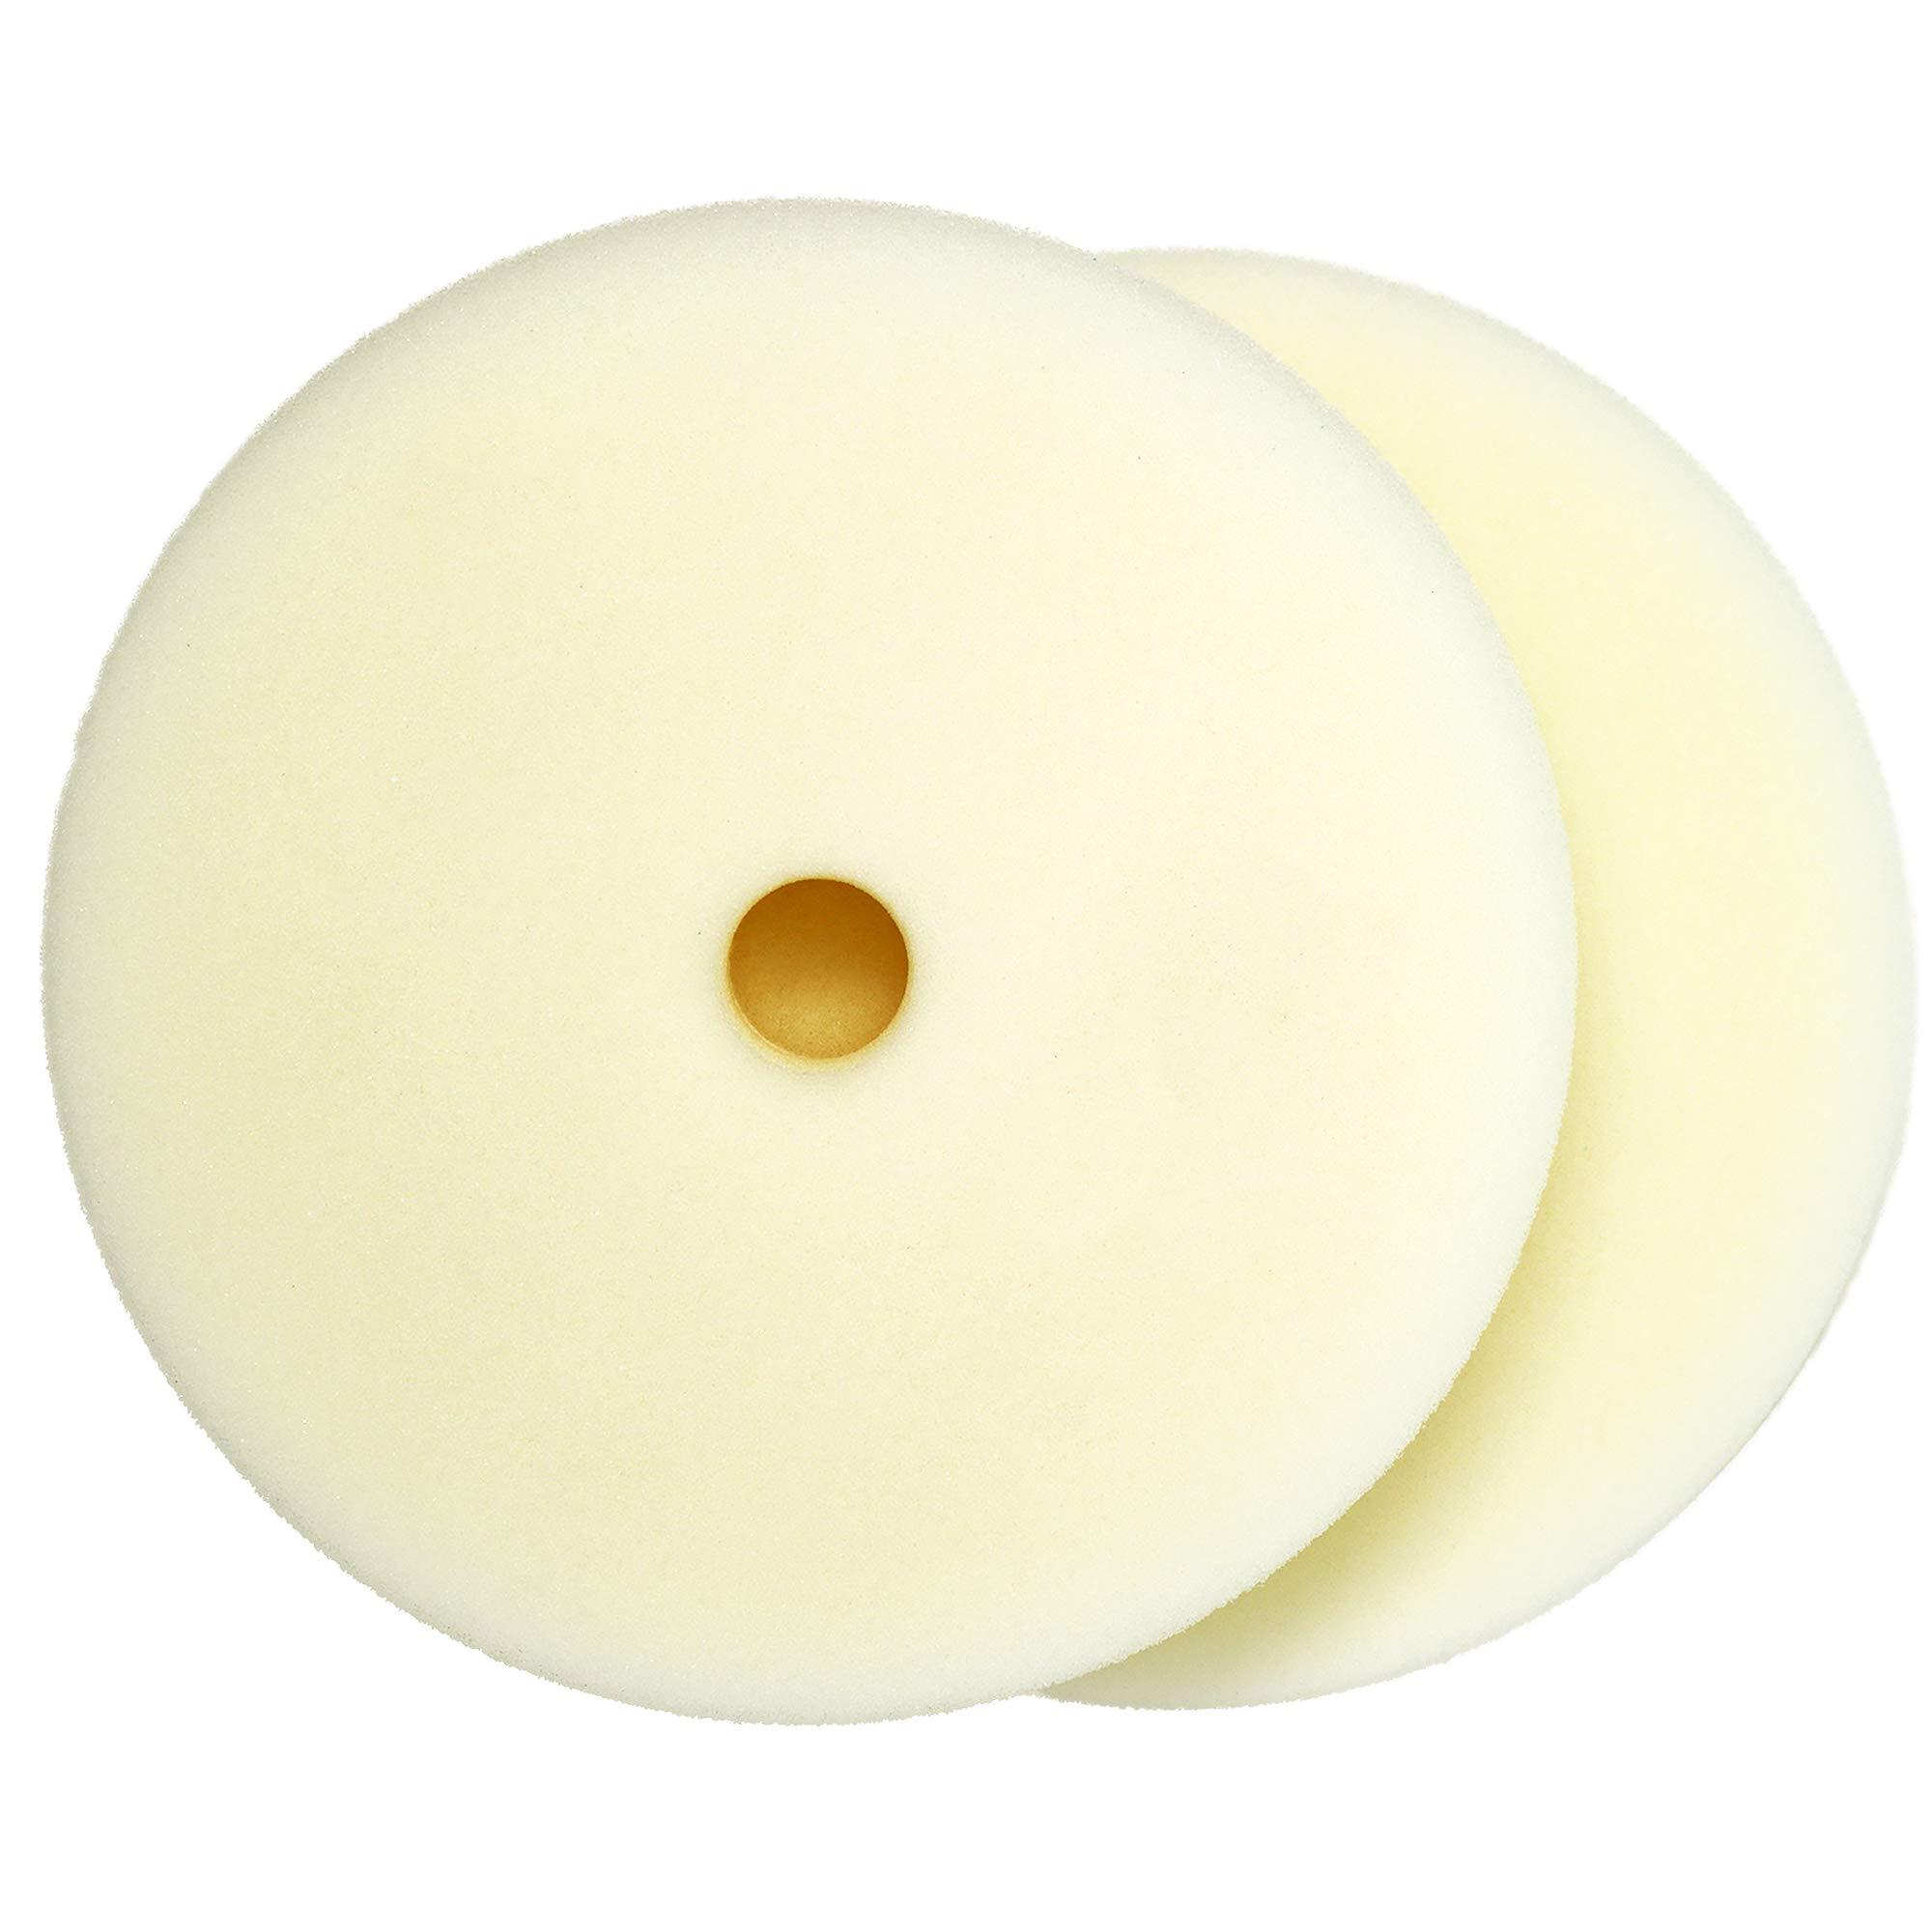 Rupes White Ultrafine Finishing Foam Pad 7'' (155mm/180mm) - 2 Pack